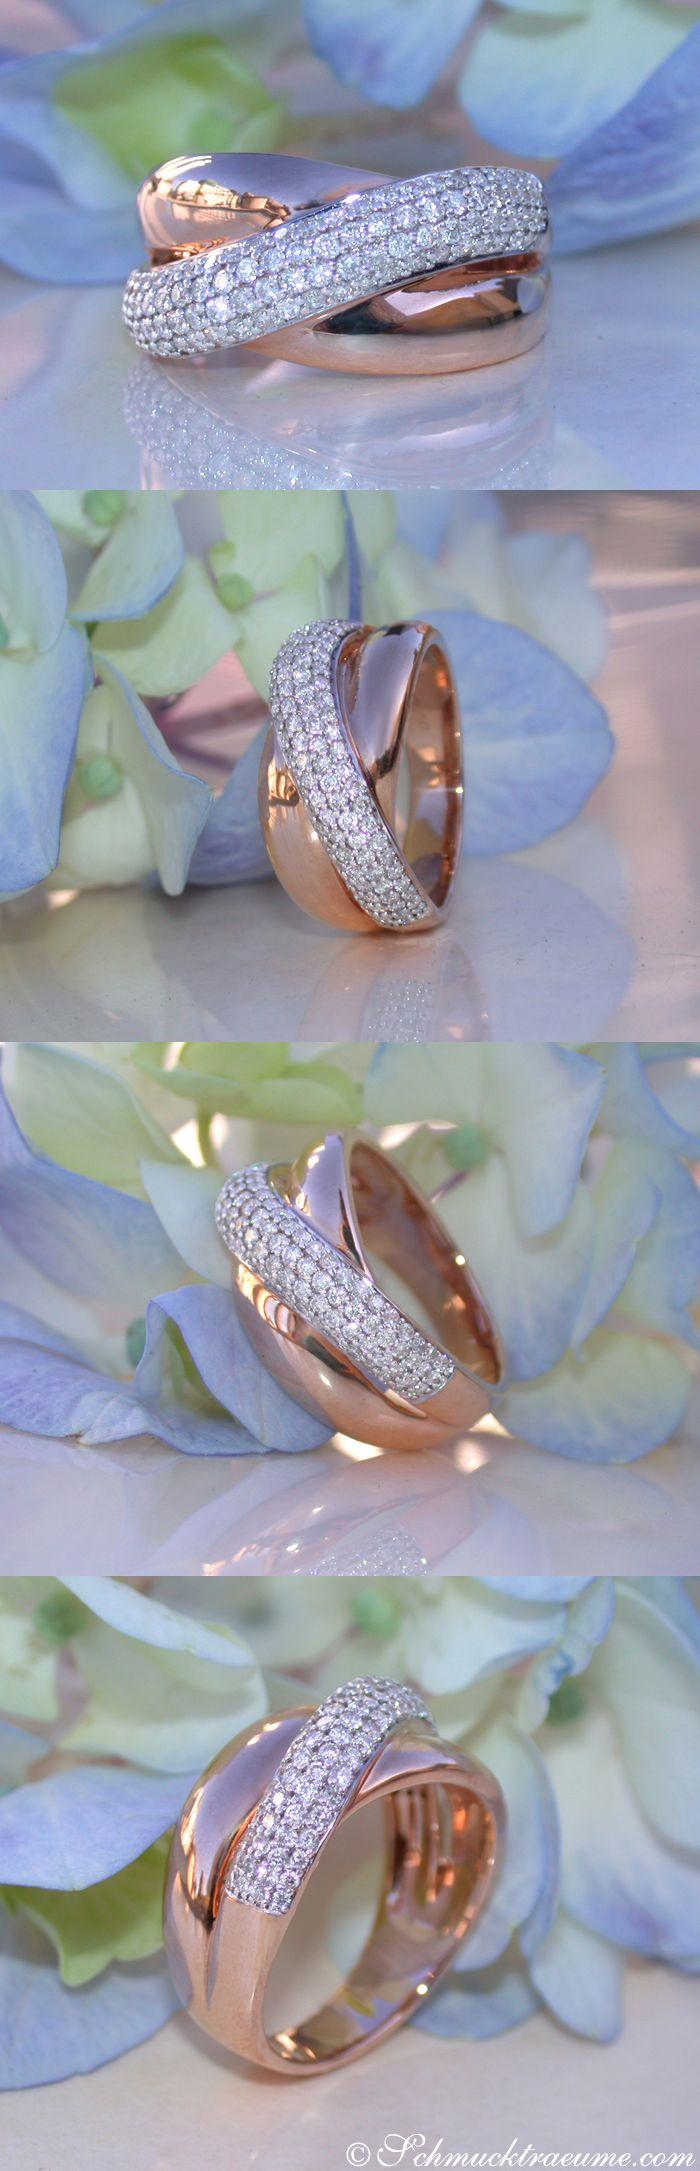 Elegant: Crossover Diamond Ring in Rosegold 18k (0.65 ct. H SI1/2) - schmucktraeume.com Like: https://www.facebook.com/Noble-Juwelen-150871984924926/